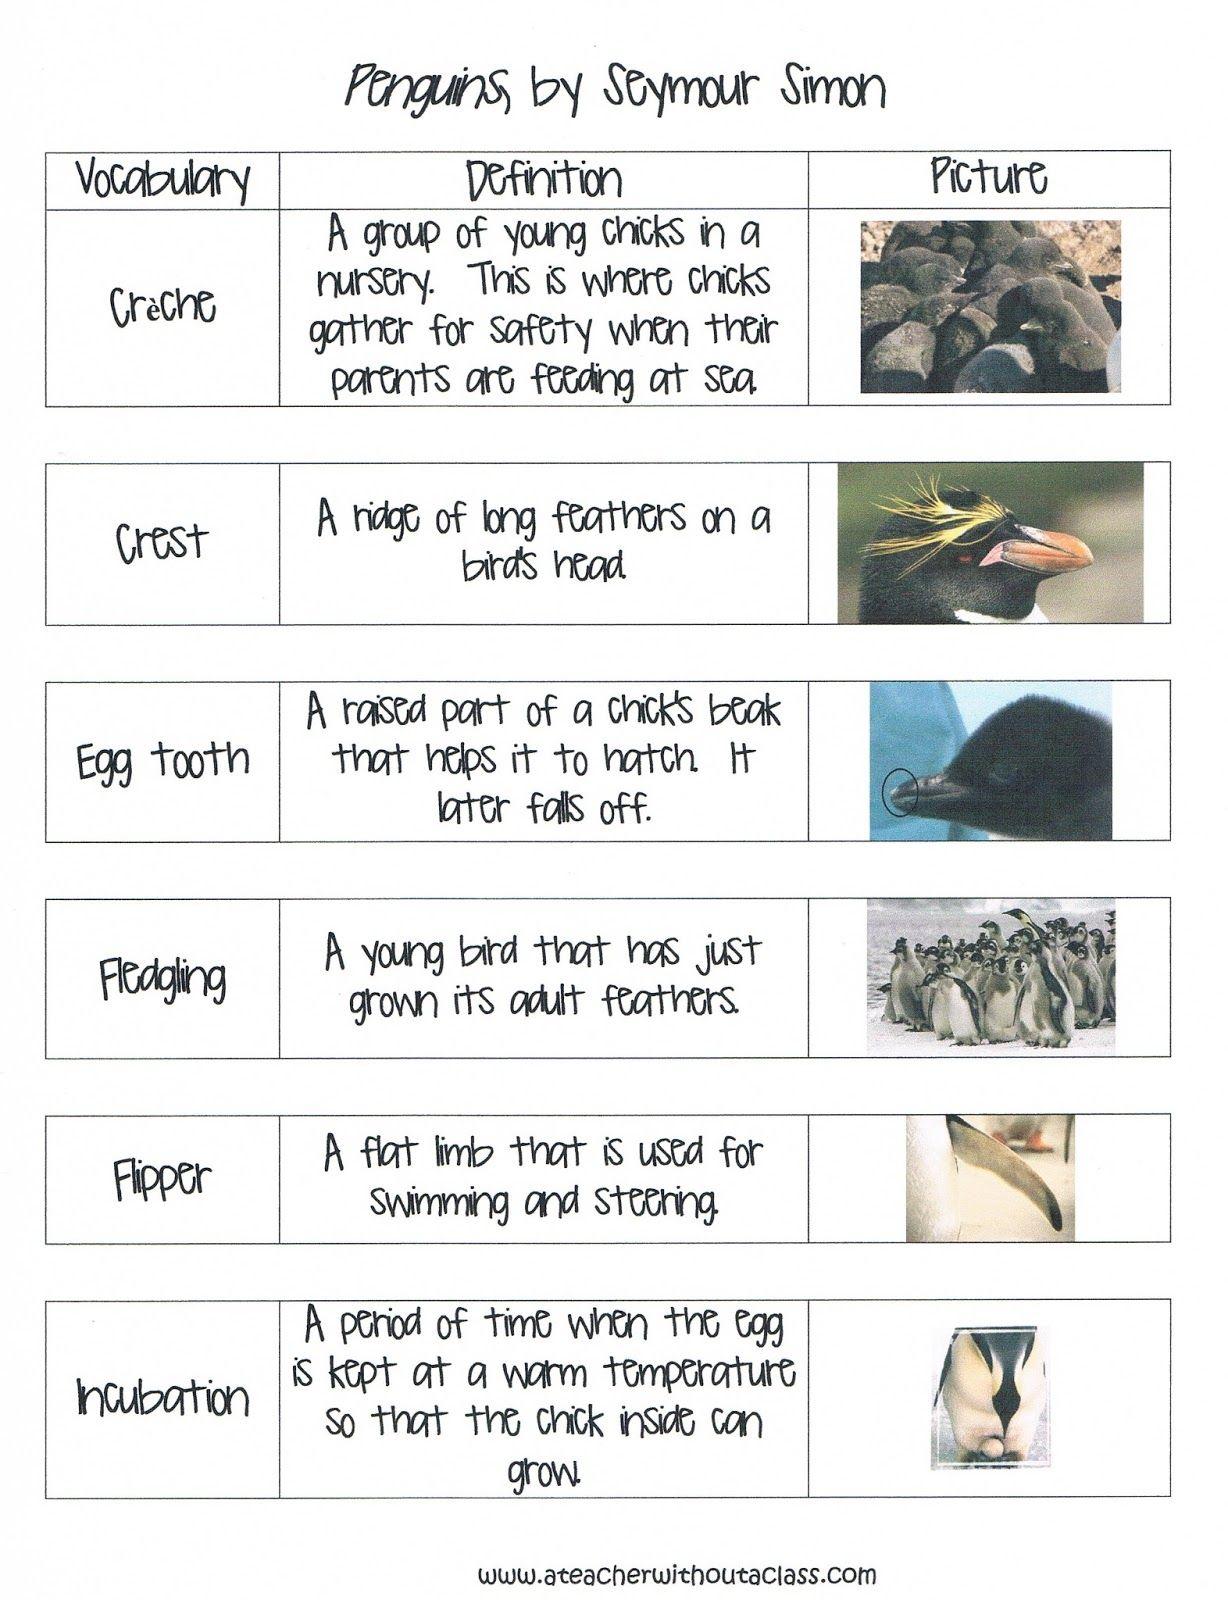 Penguin Vocabulary